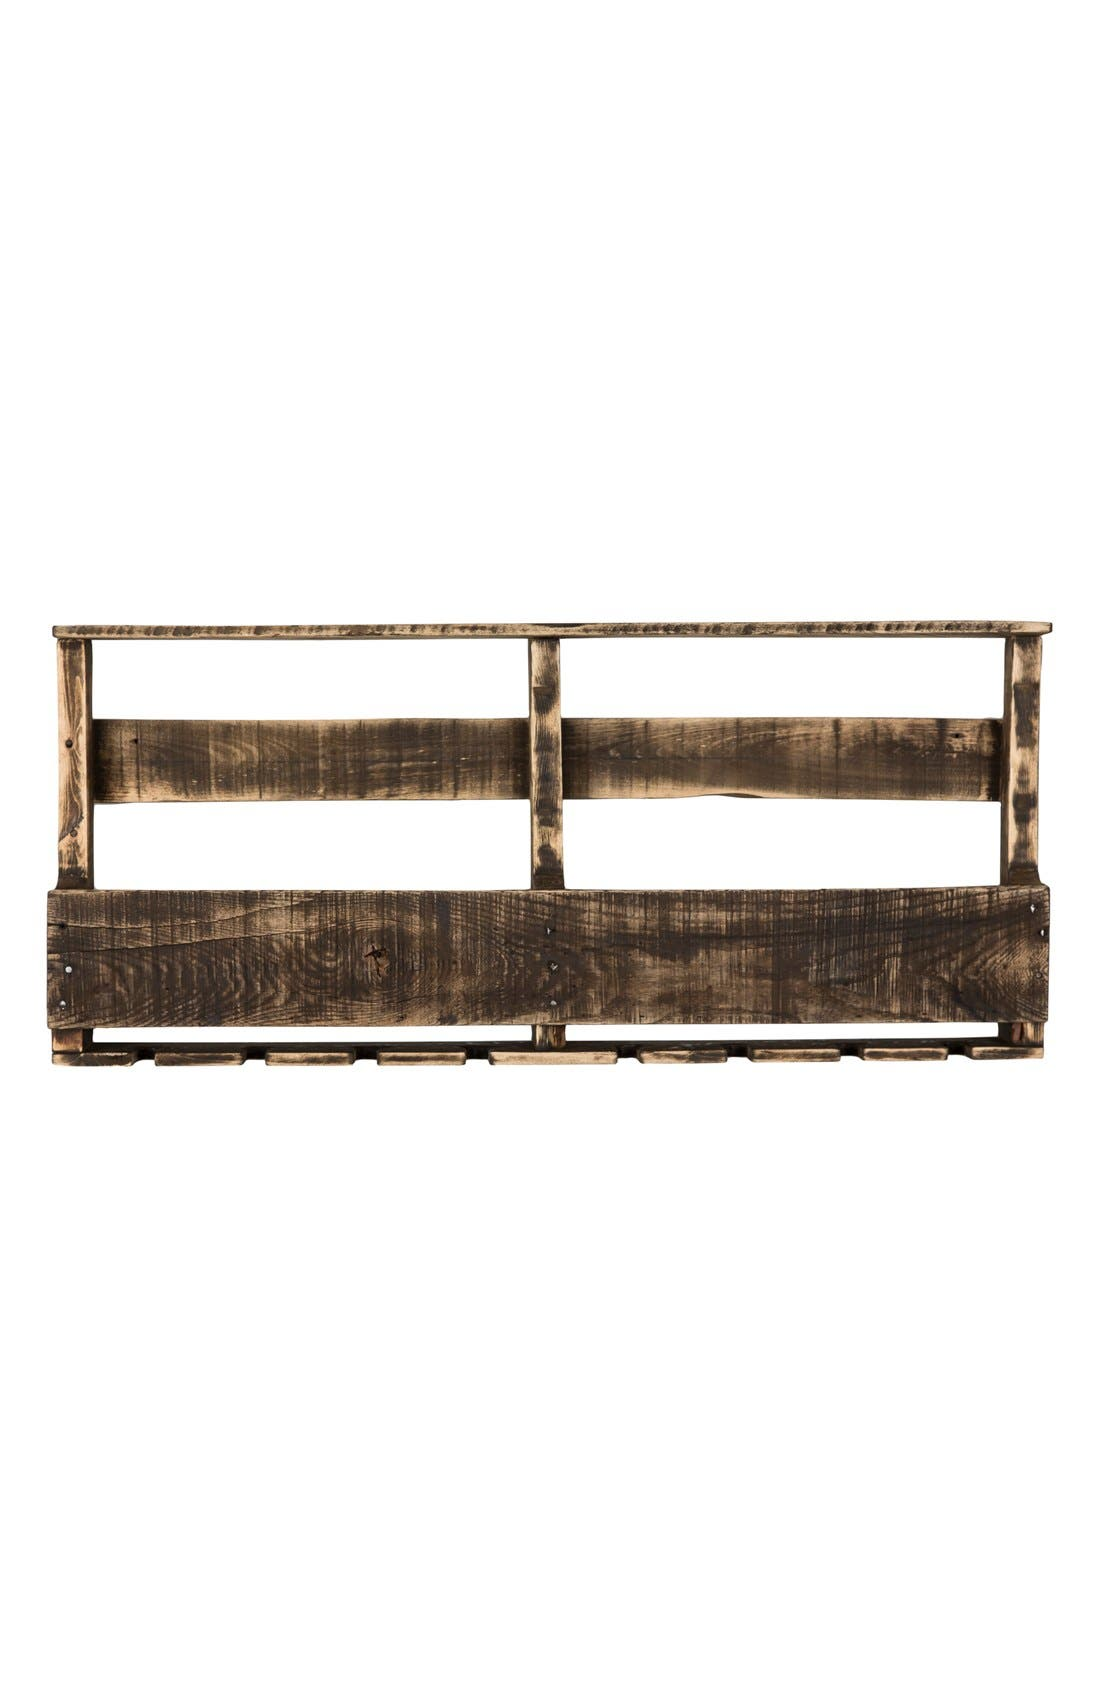 (del) Hutson Designs 'Top Shelf' RepurposedWood Wine Rack,                             Main thumbnail 1, color,                             Darkwalnut Distressed